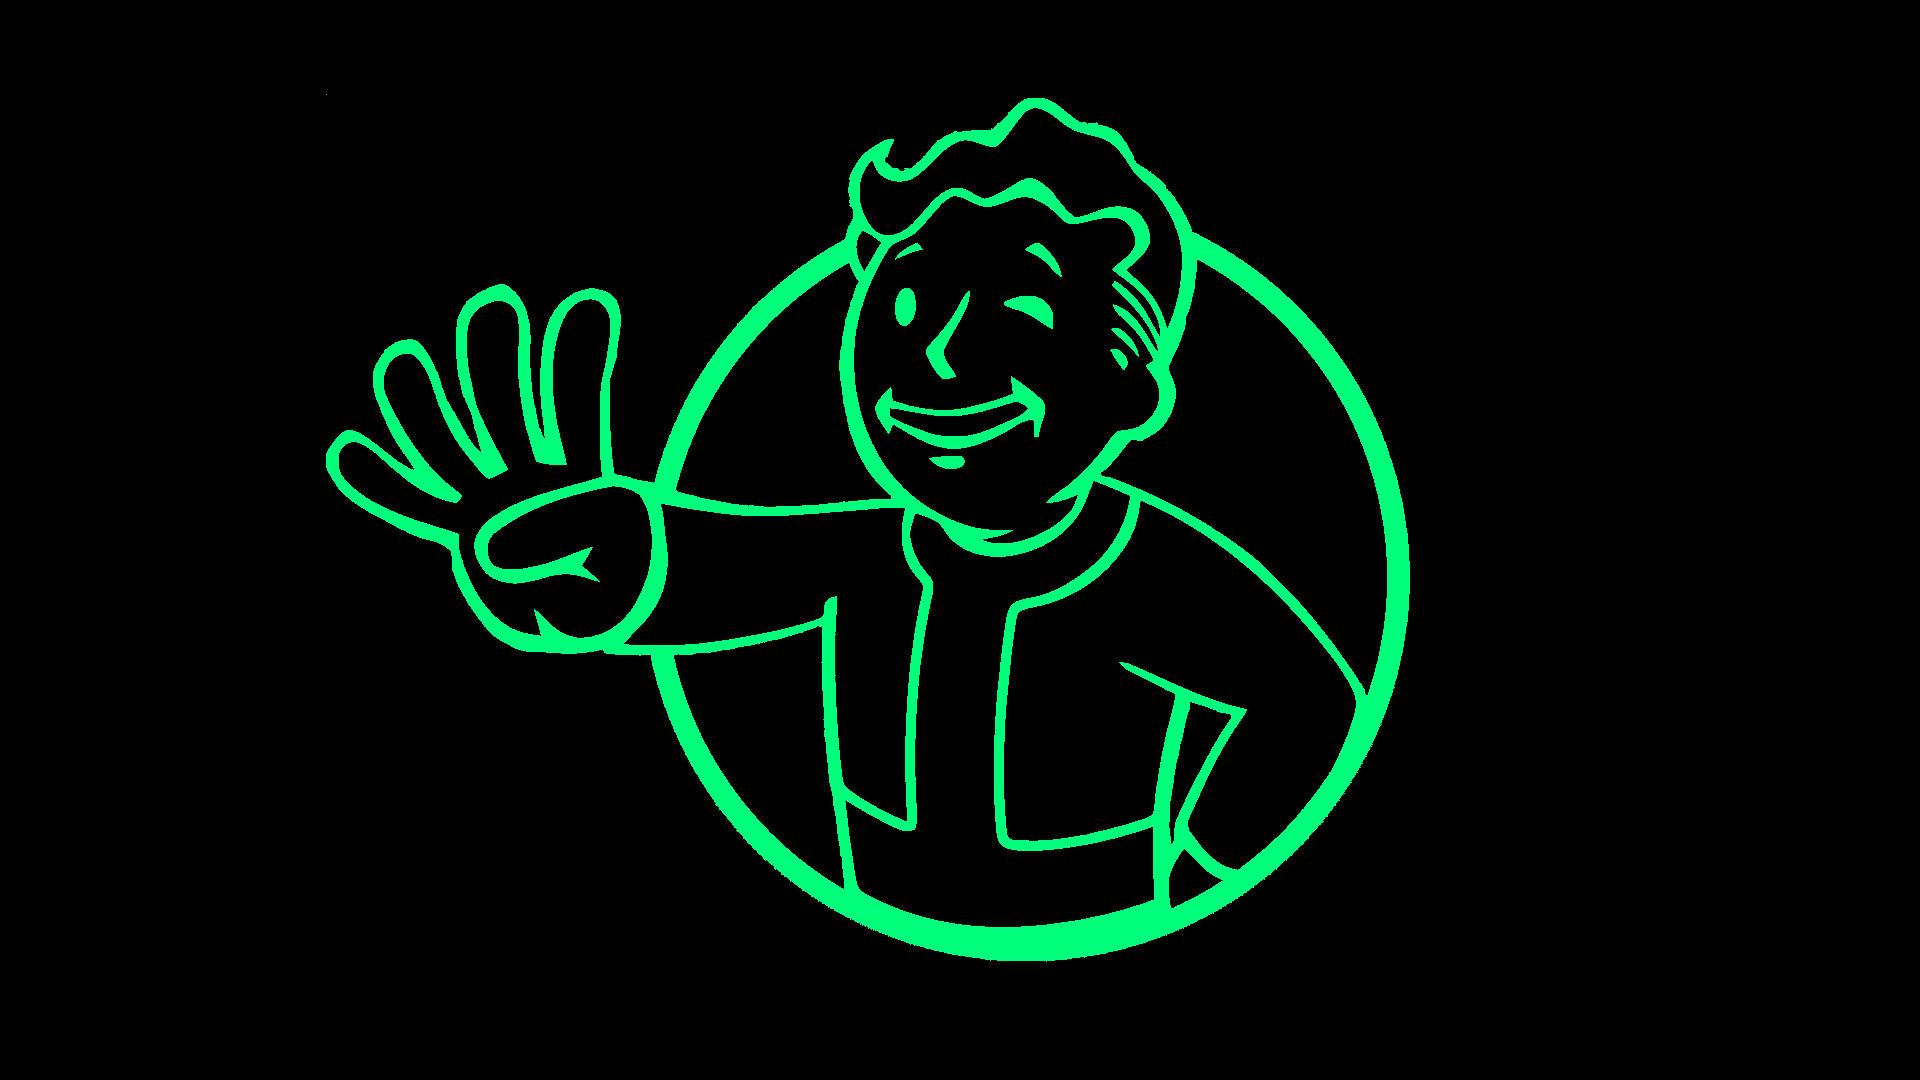 Fallout 4 Vault Boy Wallpaper 74 Images